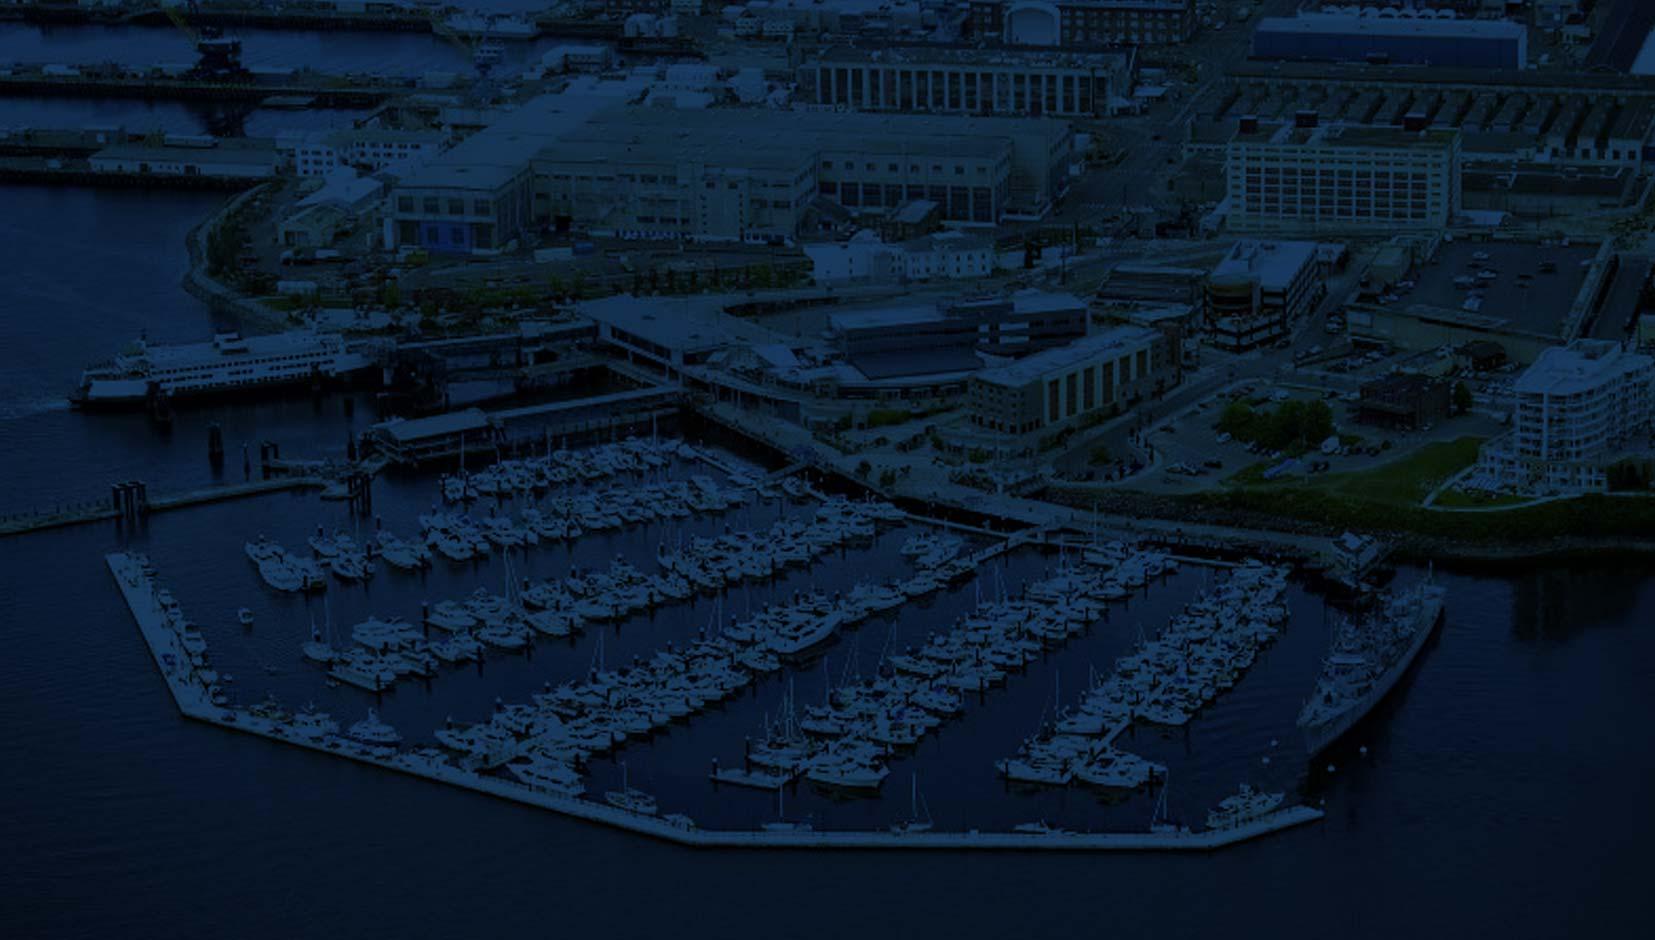 Marina, Port, and Harbor in California, Alaska, and Canada